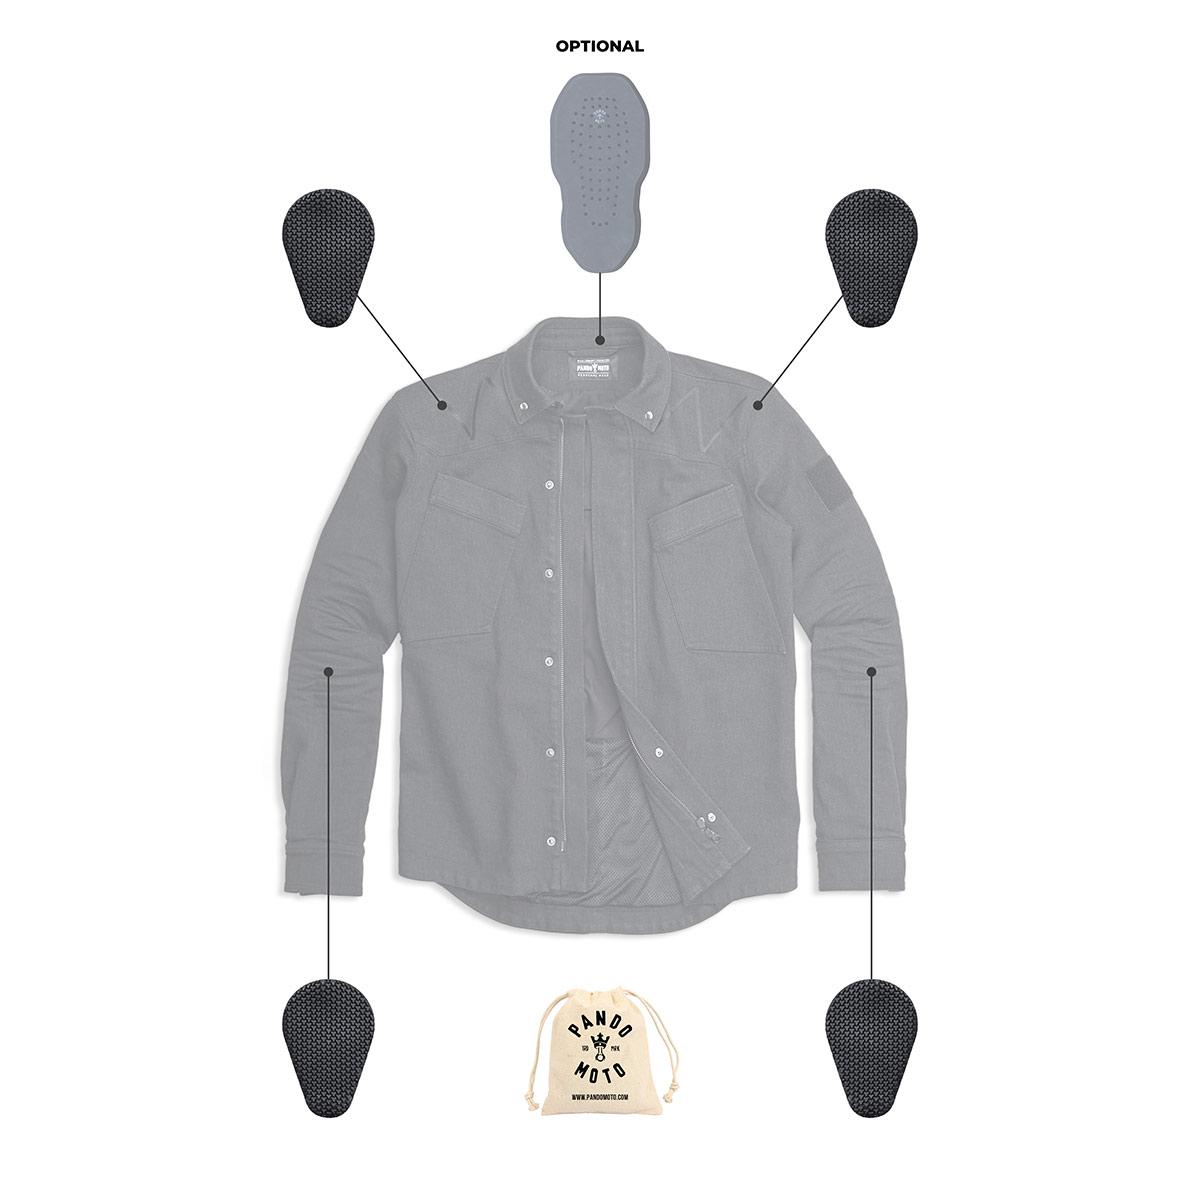 Pando Moto Capo Cor 01 Unisex Overshirt